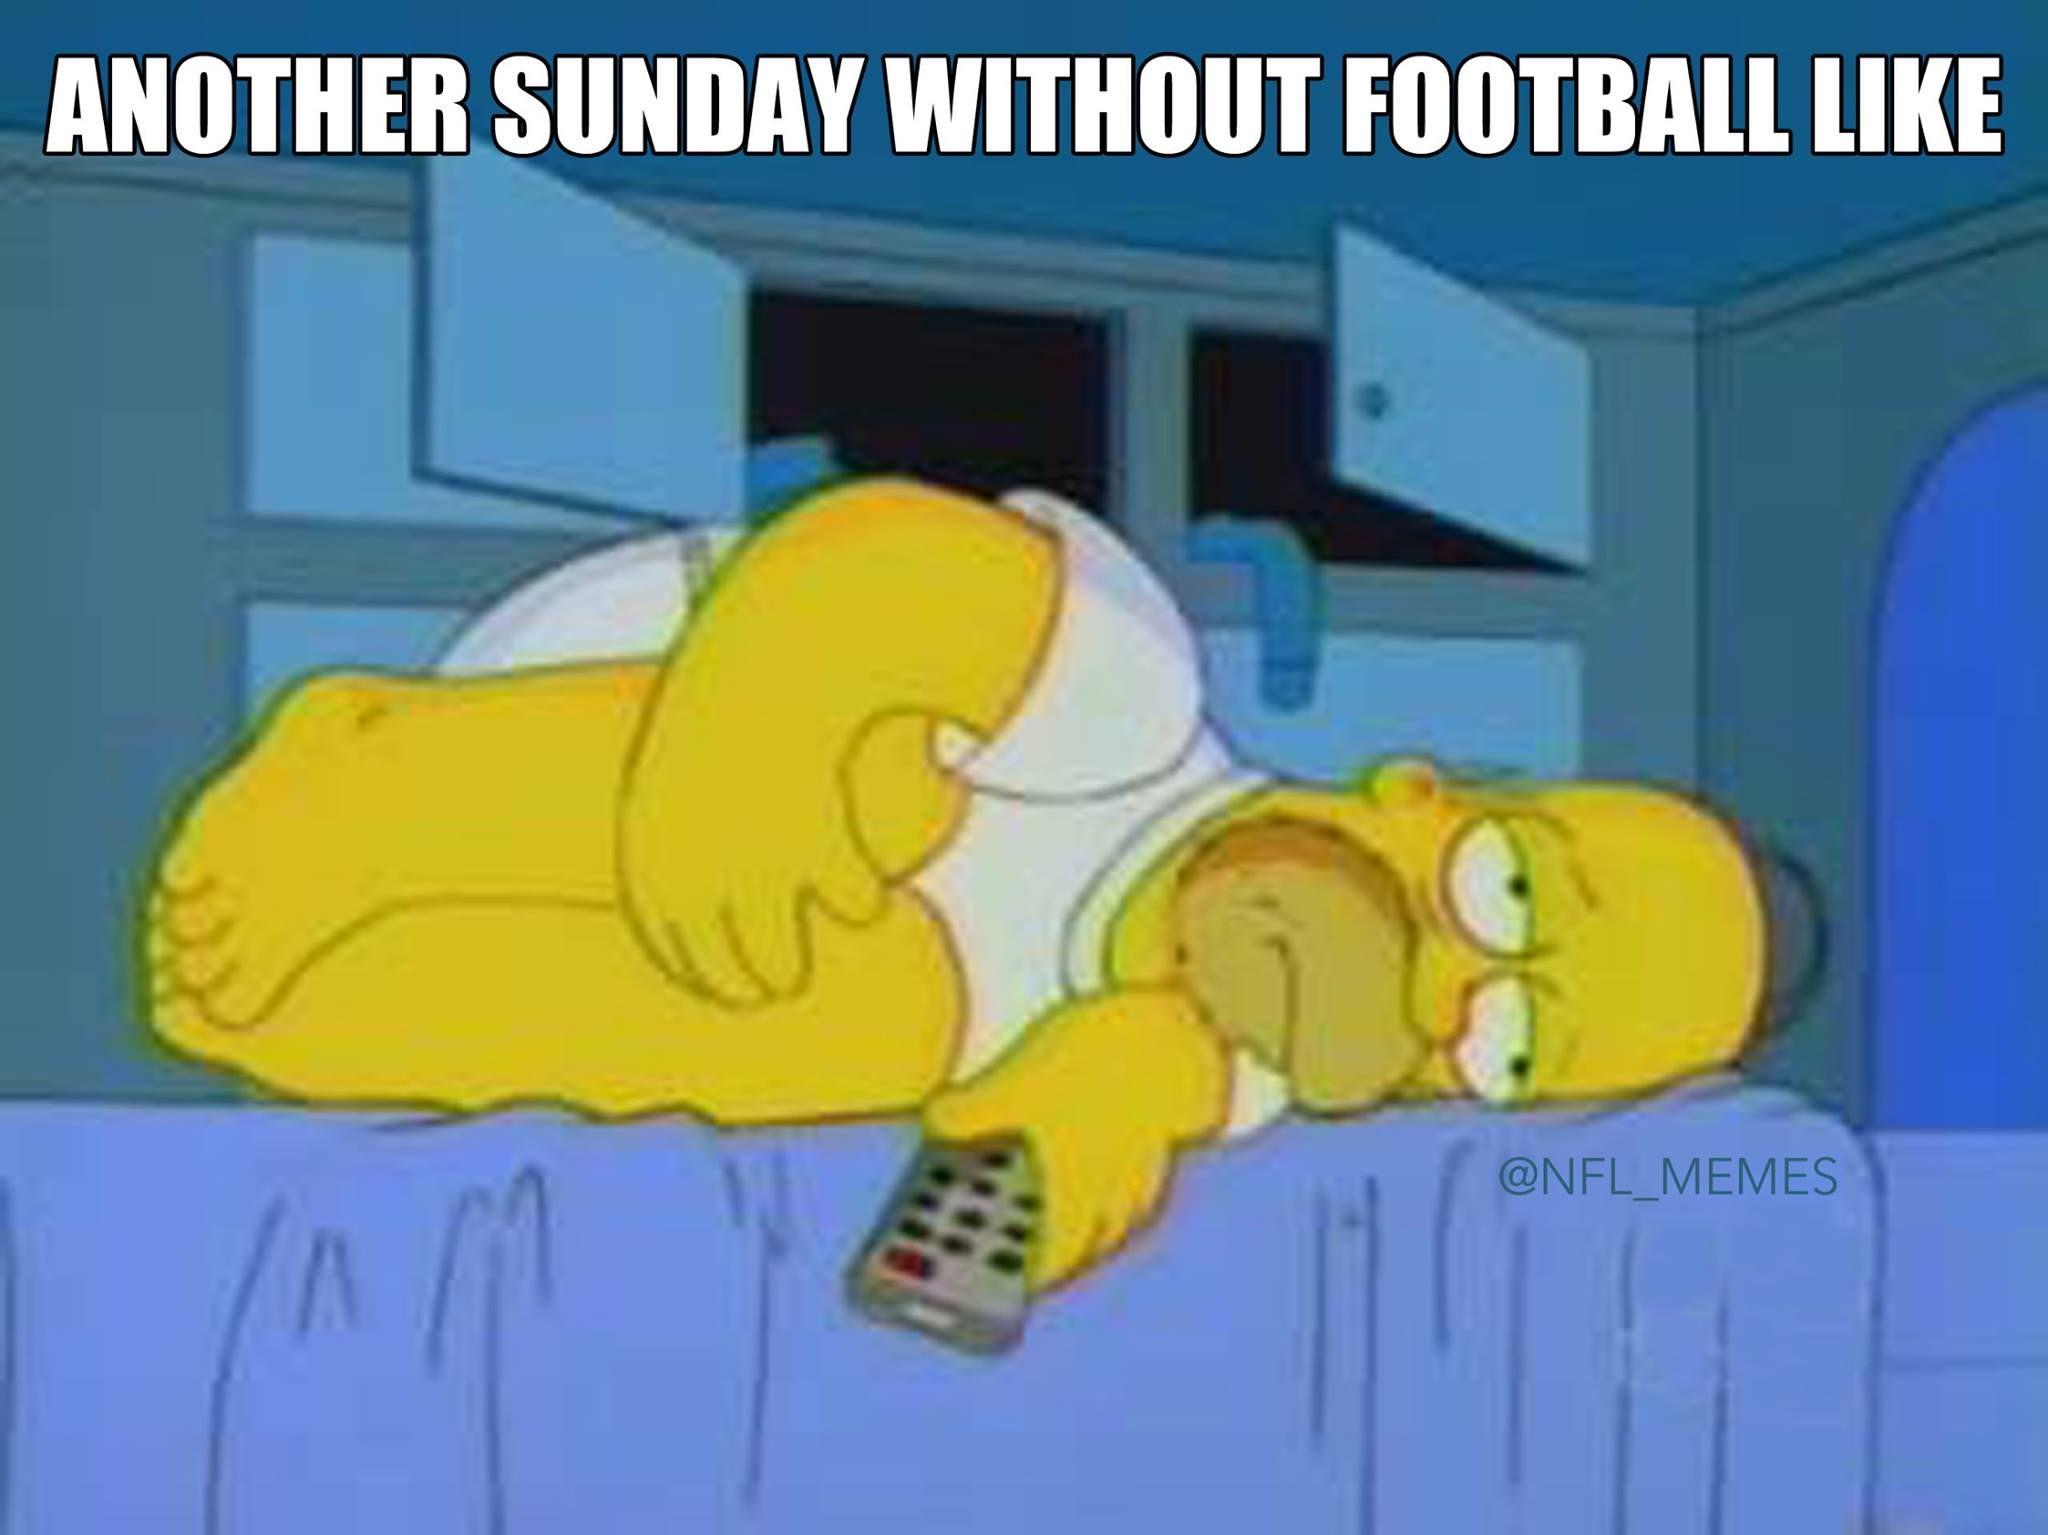 Me on Sunday's